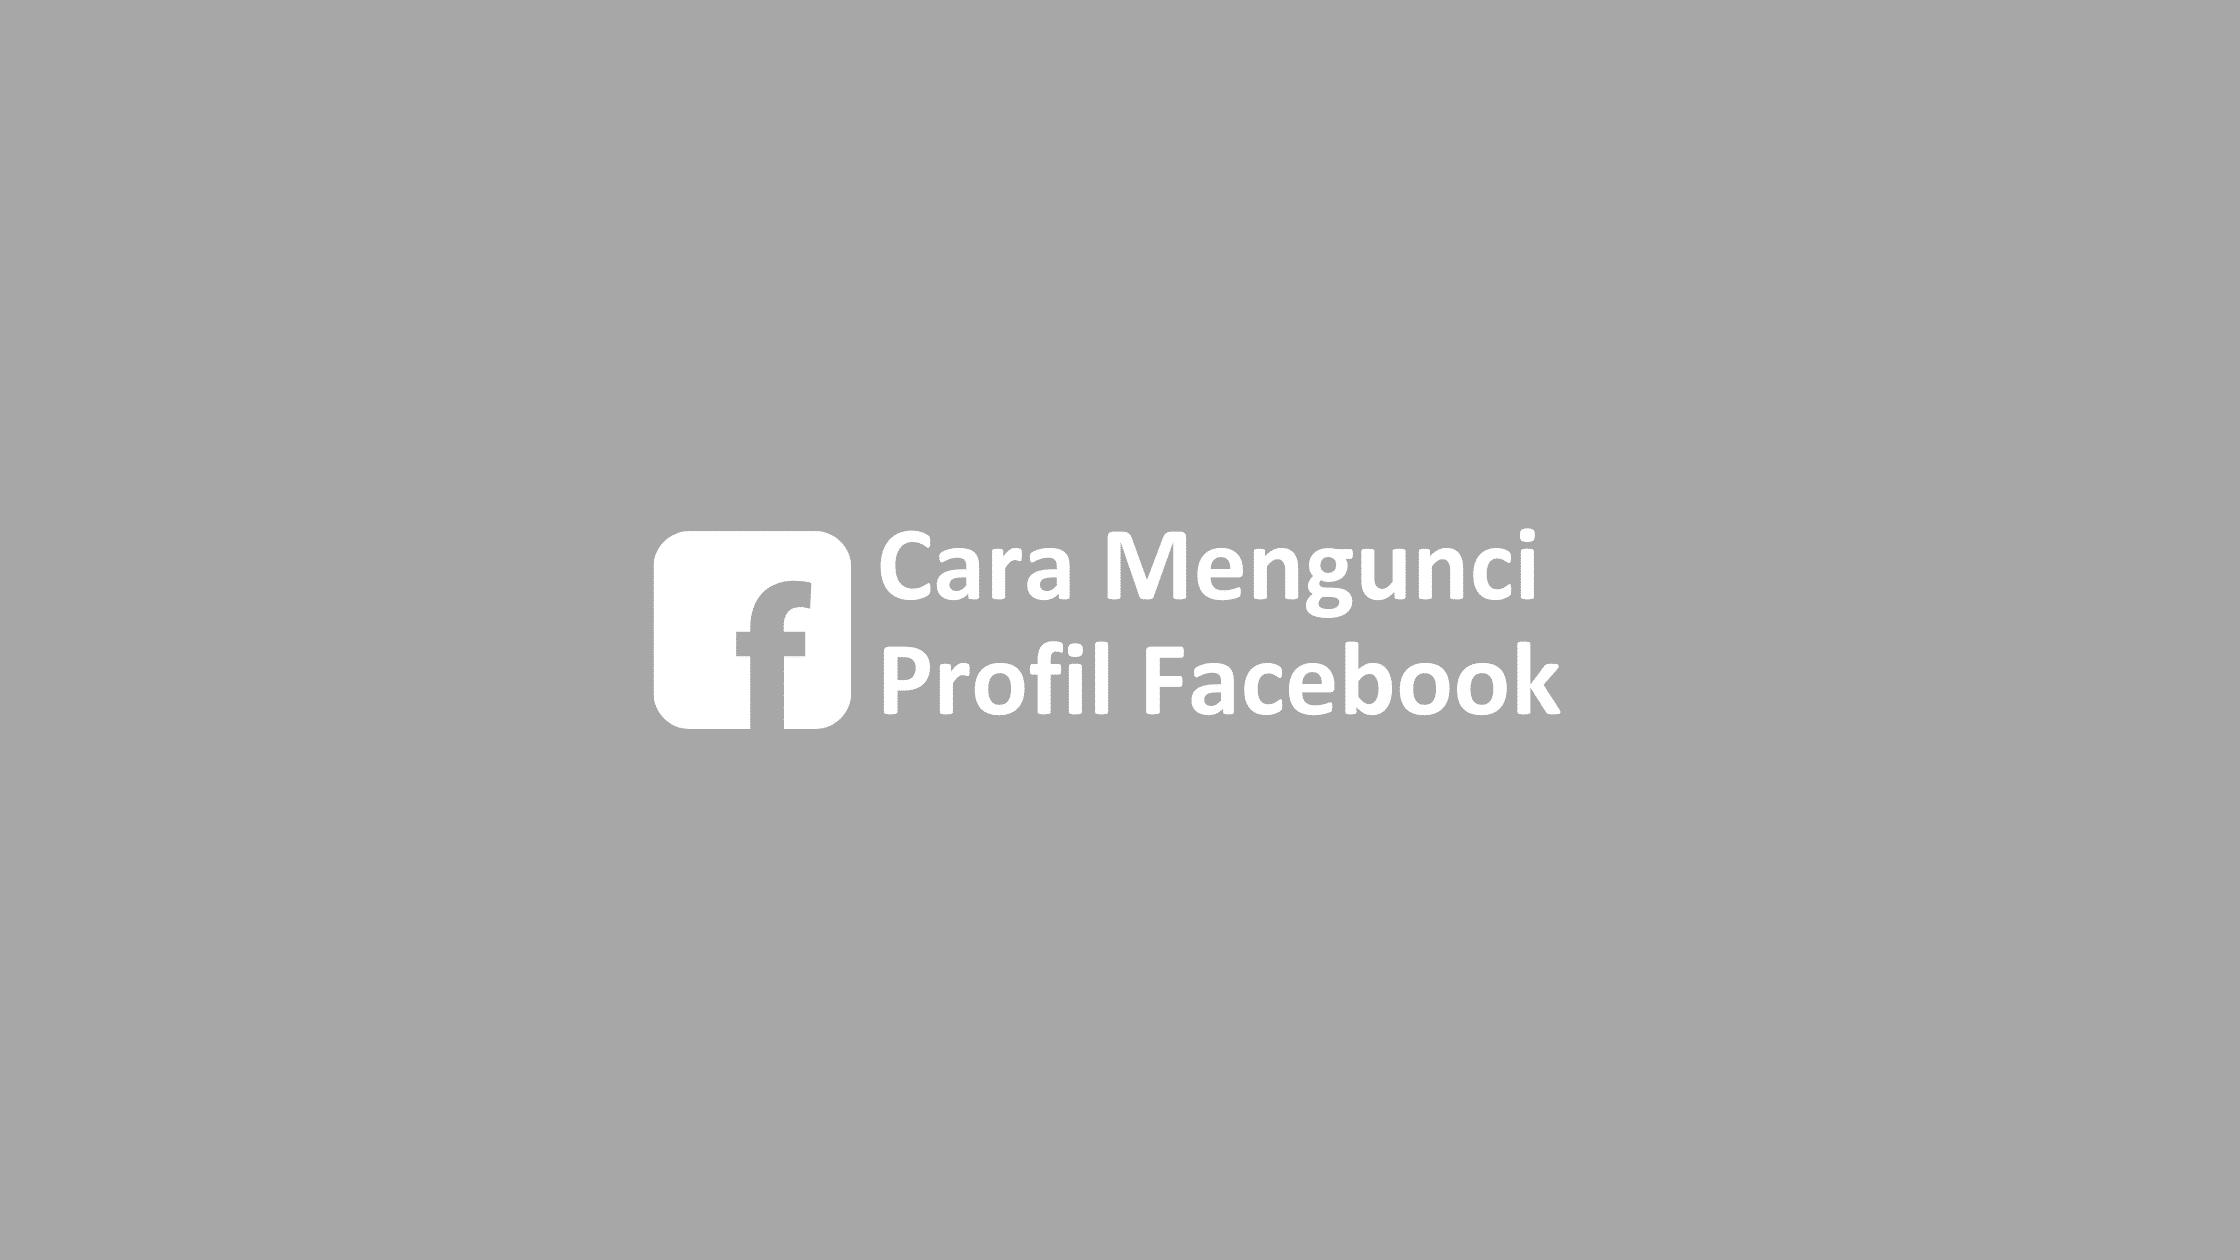 cara mengunci profil facebook